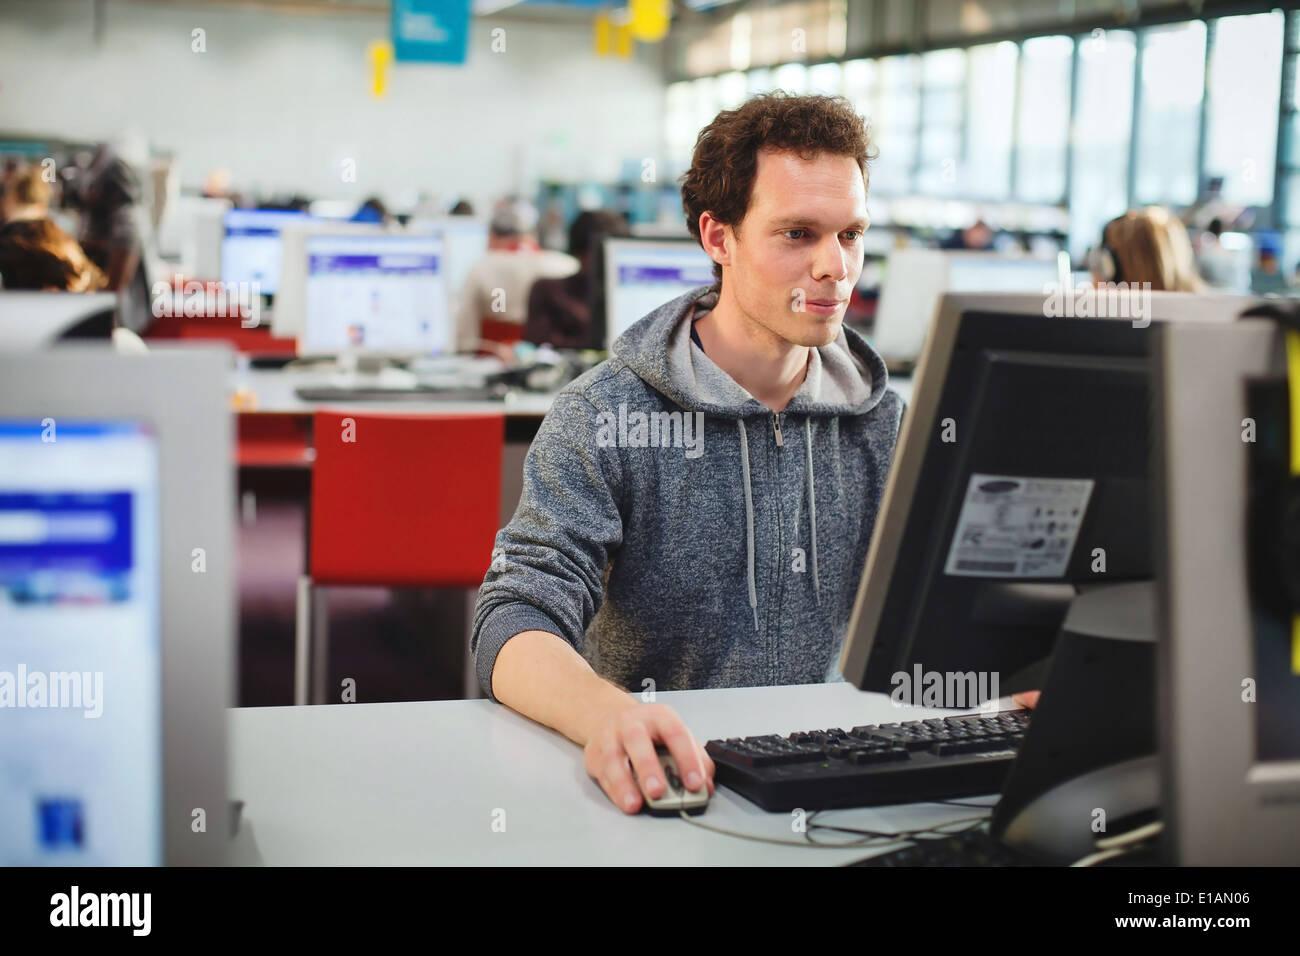 computer education - Stock Image